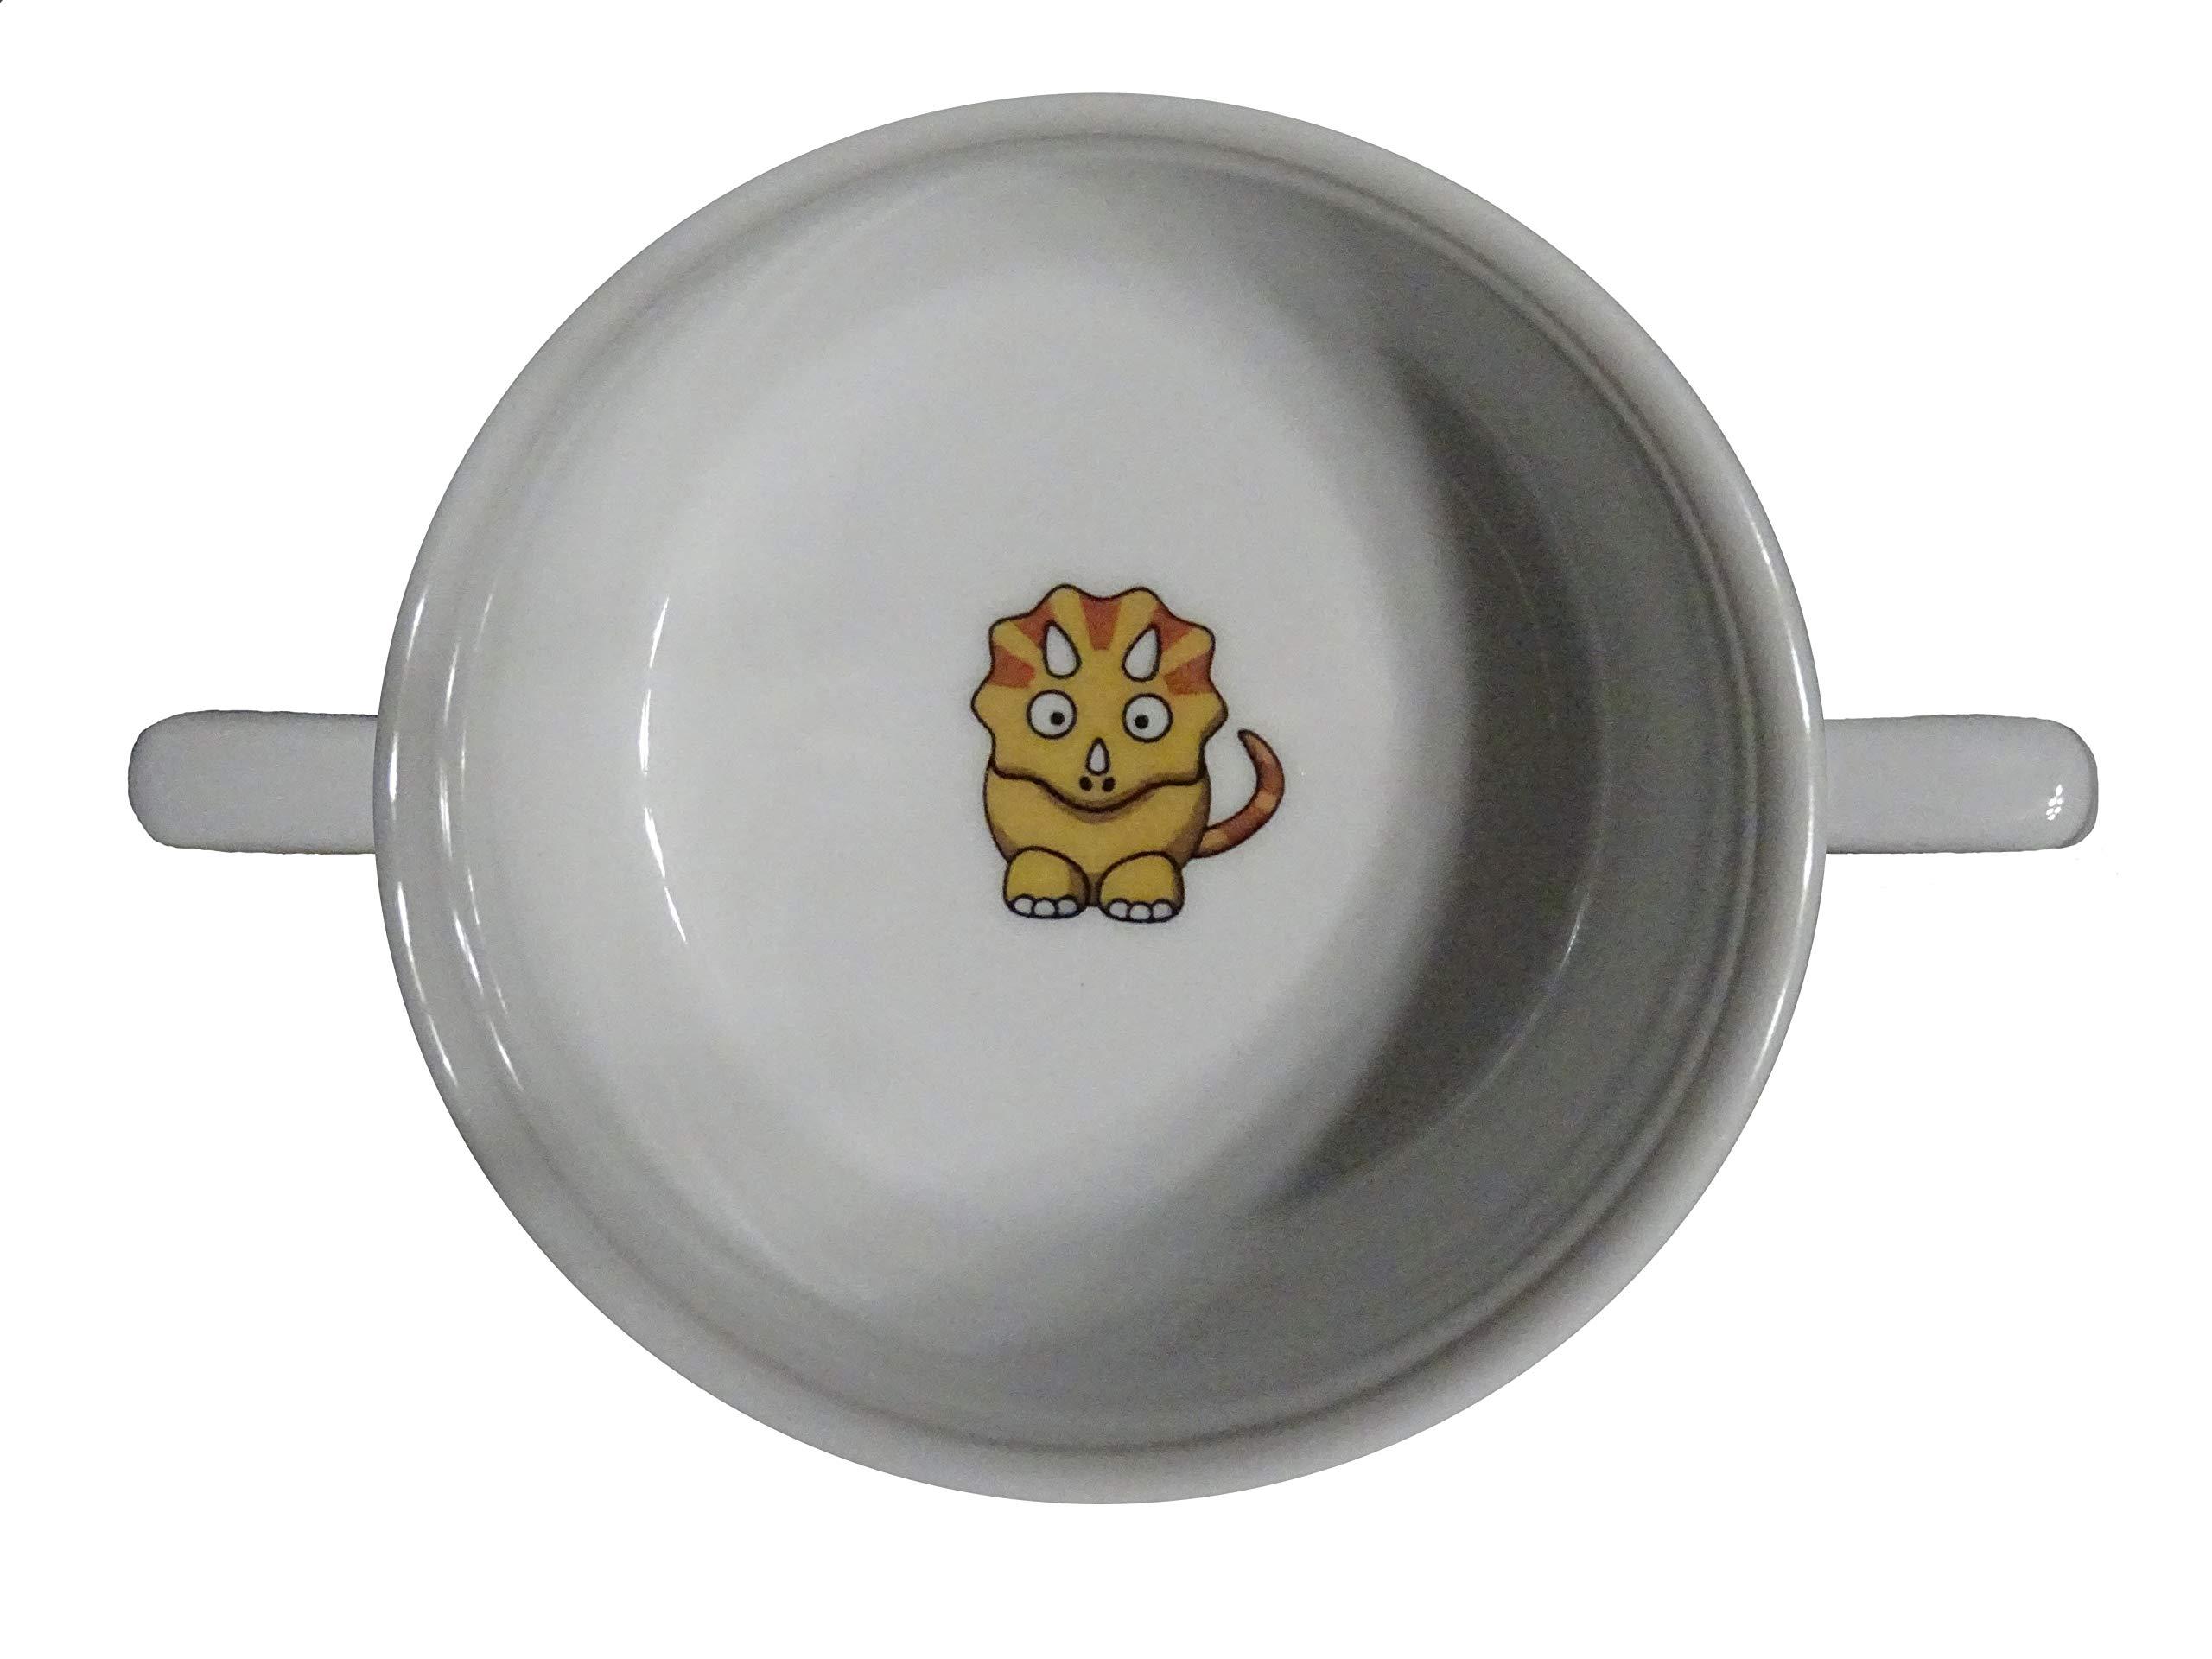 Soup Bowl 7, 1 pcs, Dinosaur Soup Bowl Small Baby Child Kids, Bottom, Hidden Message, Secret Message, Cartoon, Cute Animals, Cute Animals, Dinosaur, Good Cartoon Drawings, Triceratops, Porcelain